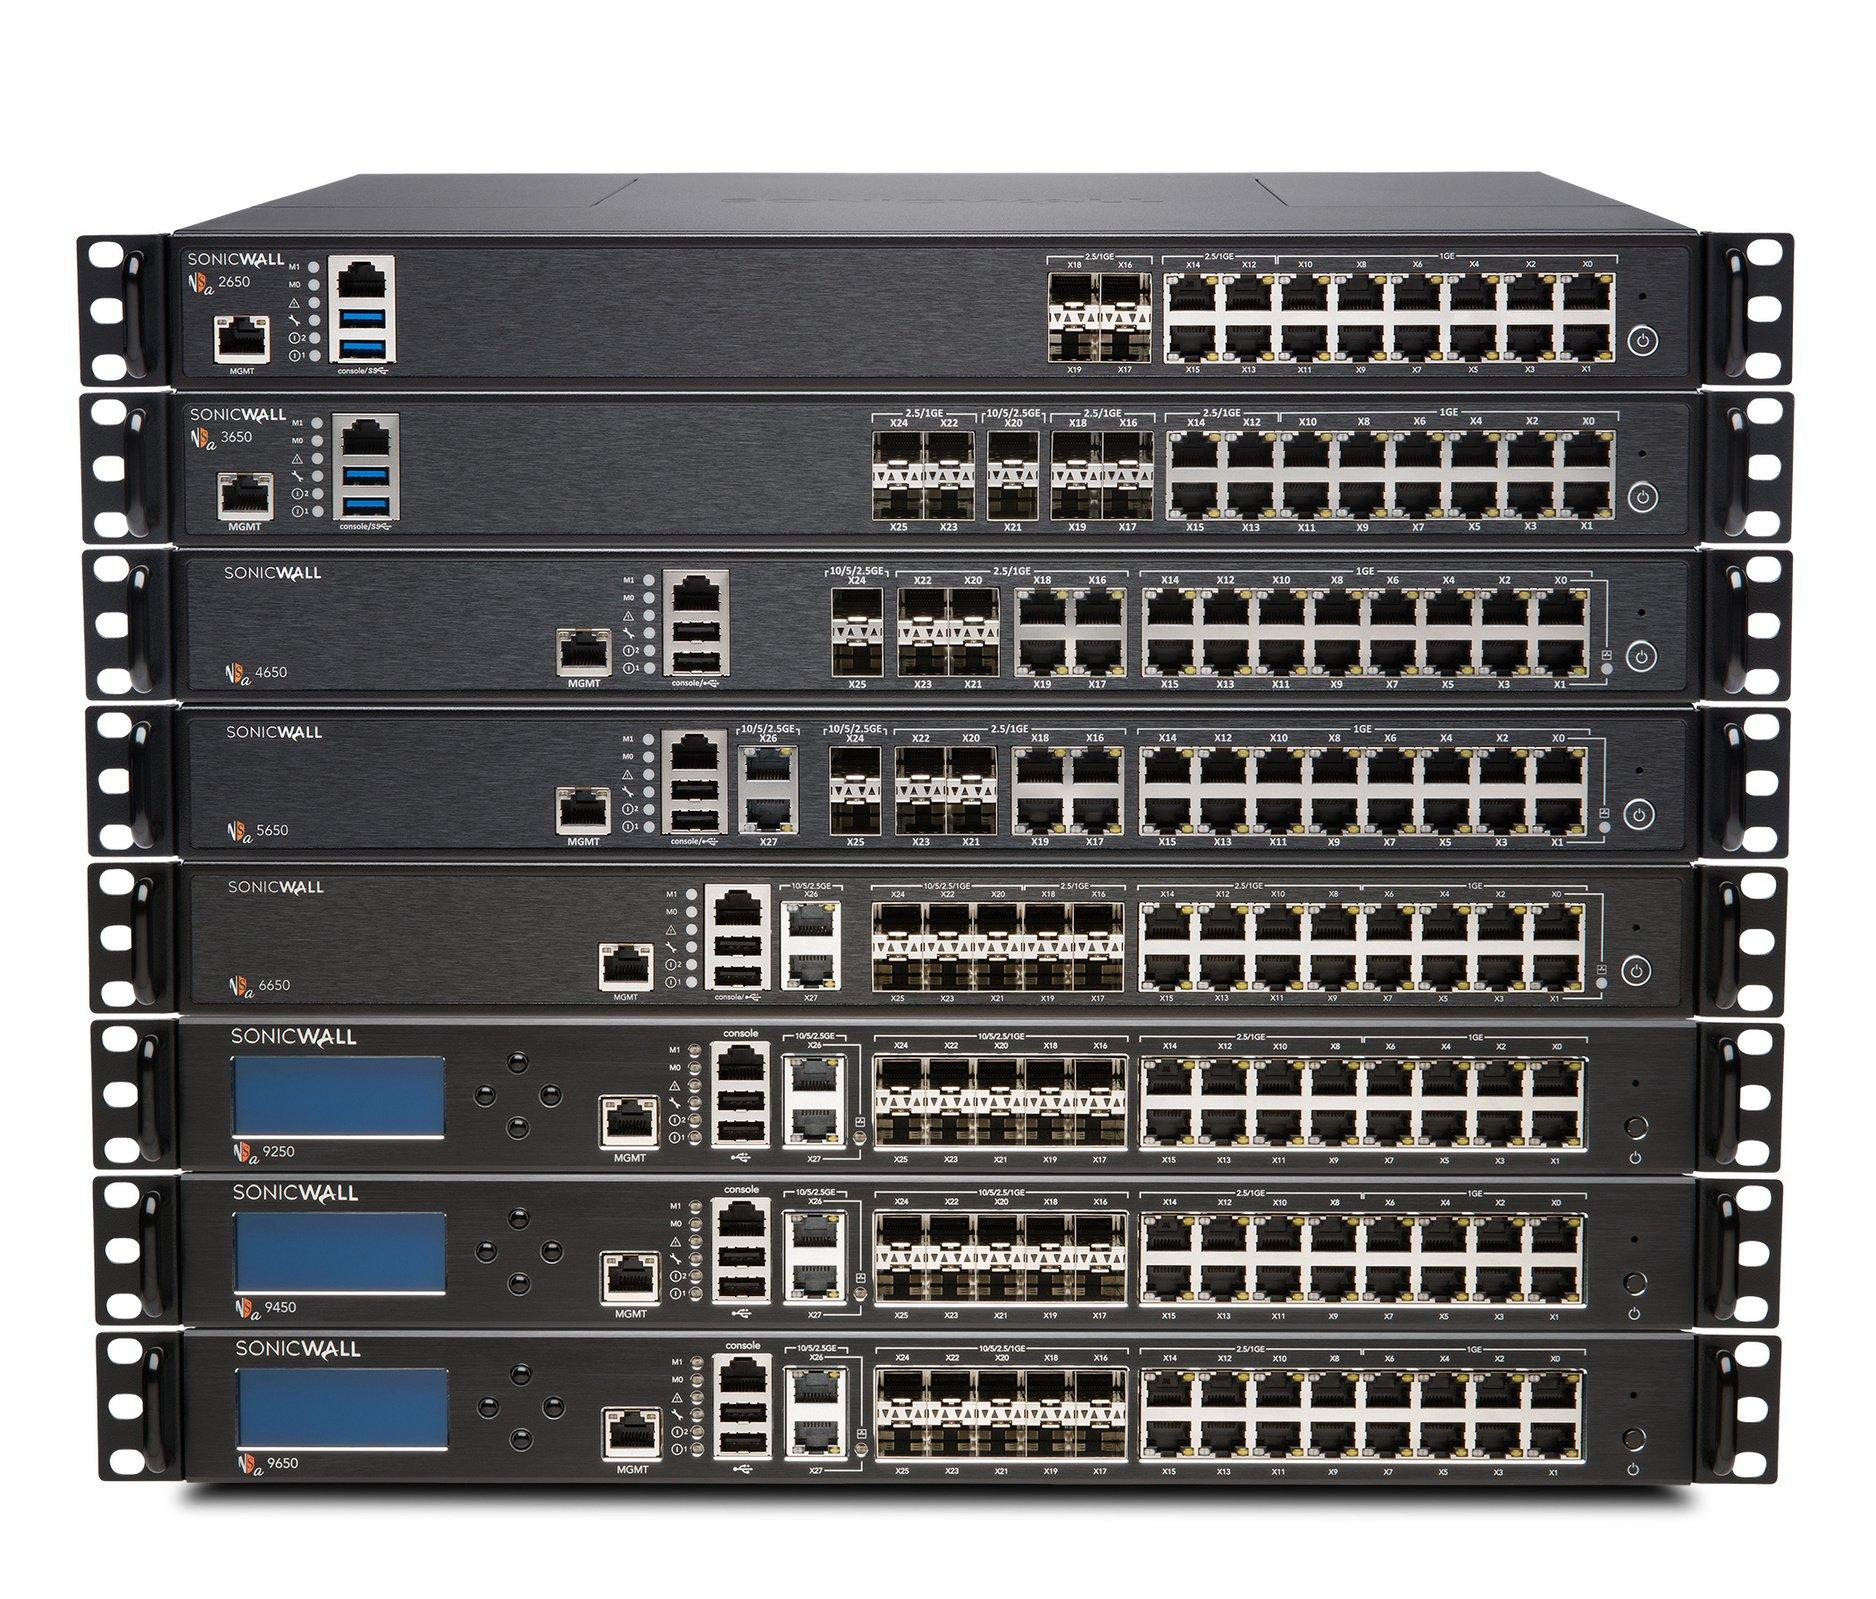 Mid Range Firewalls